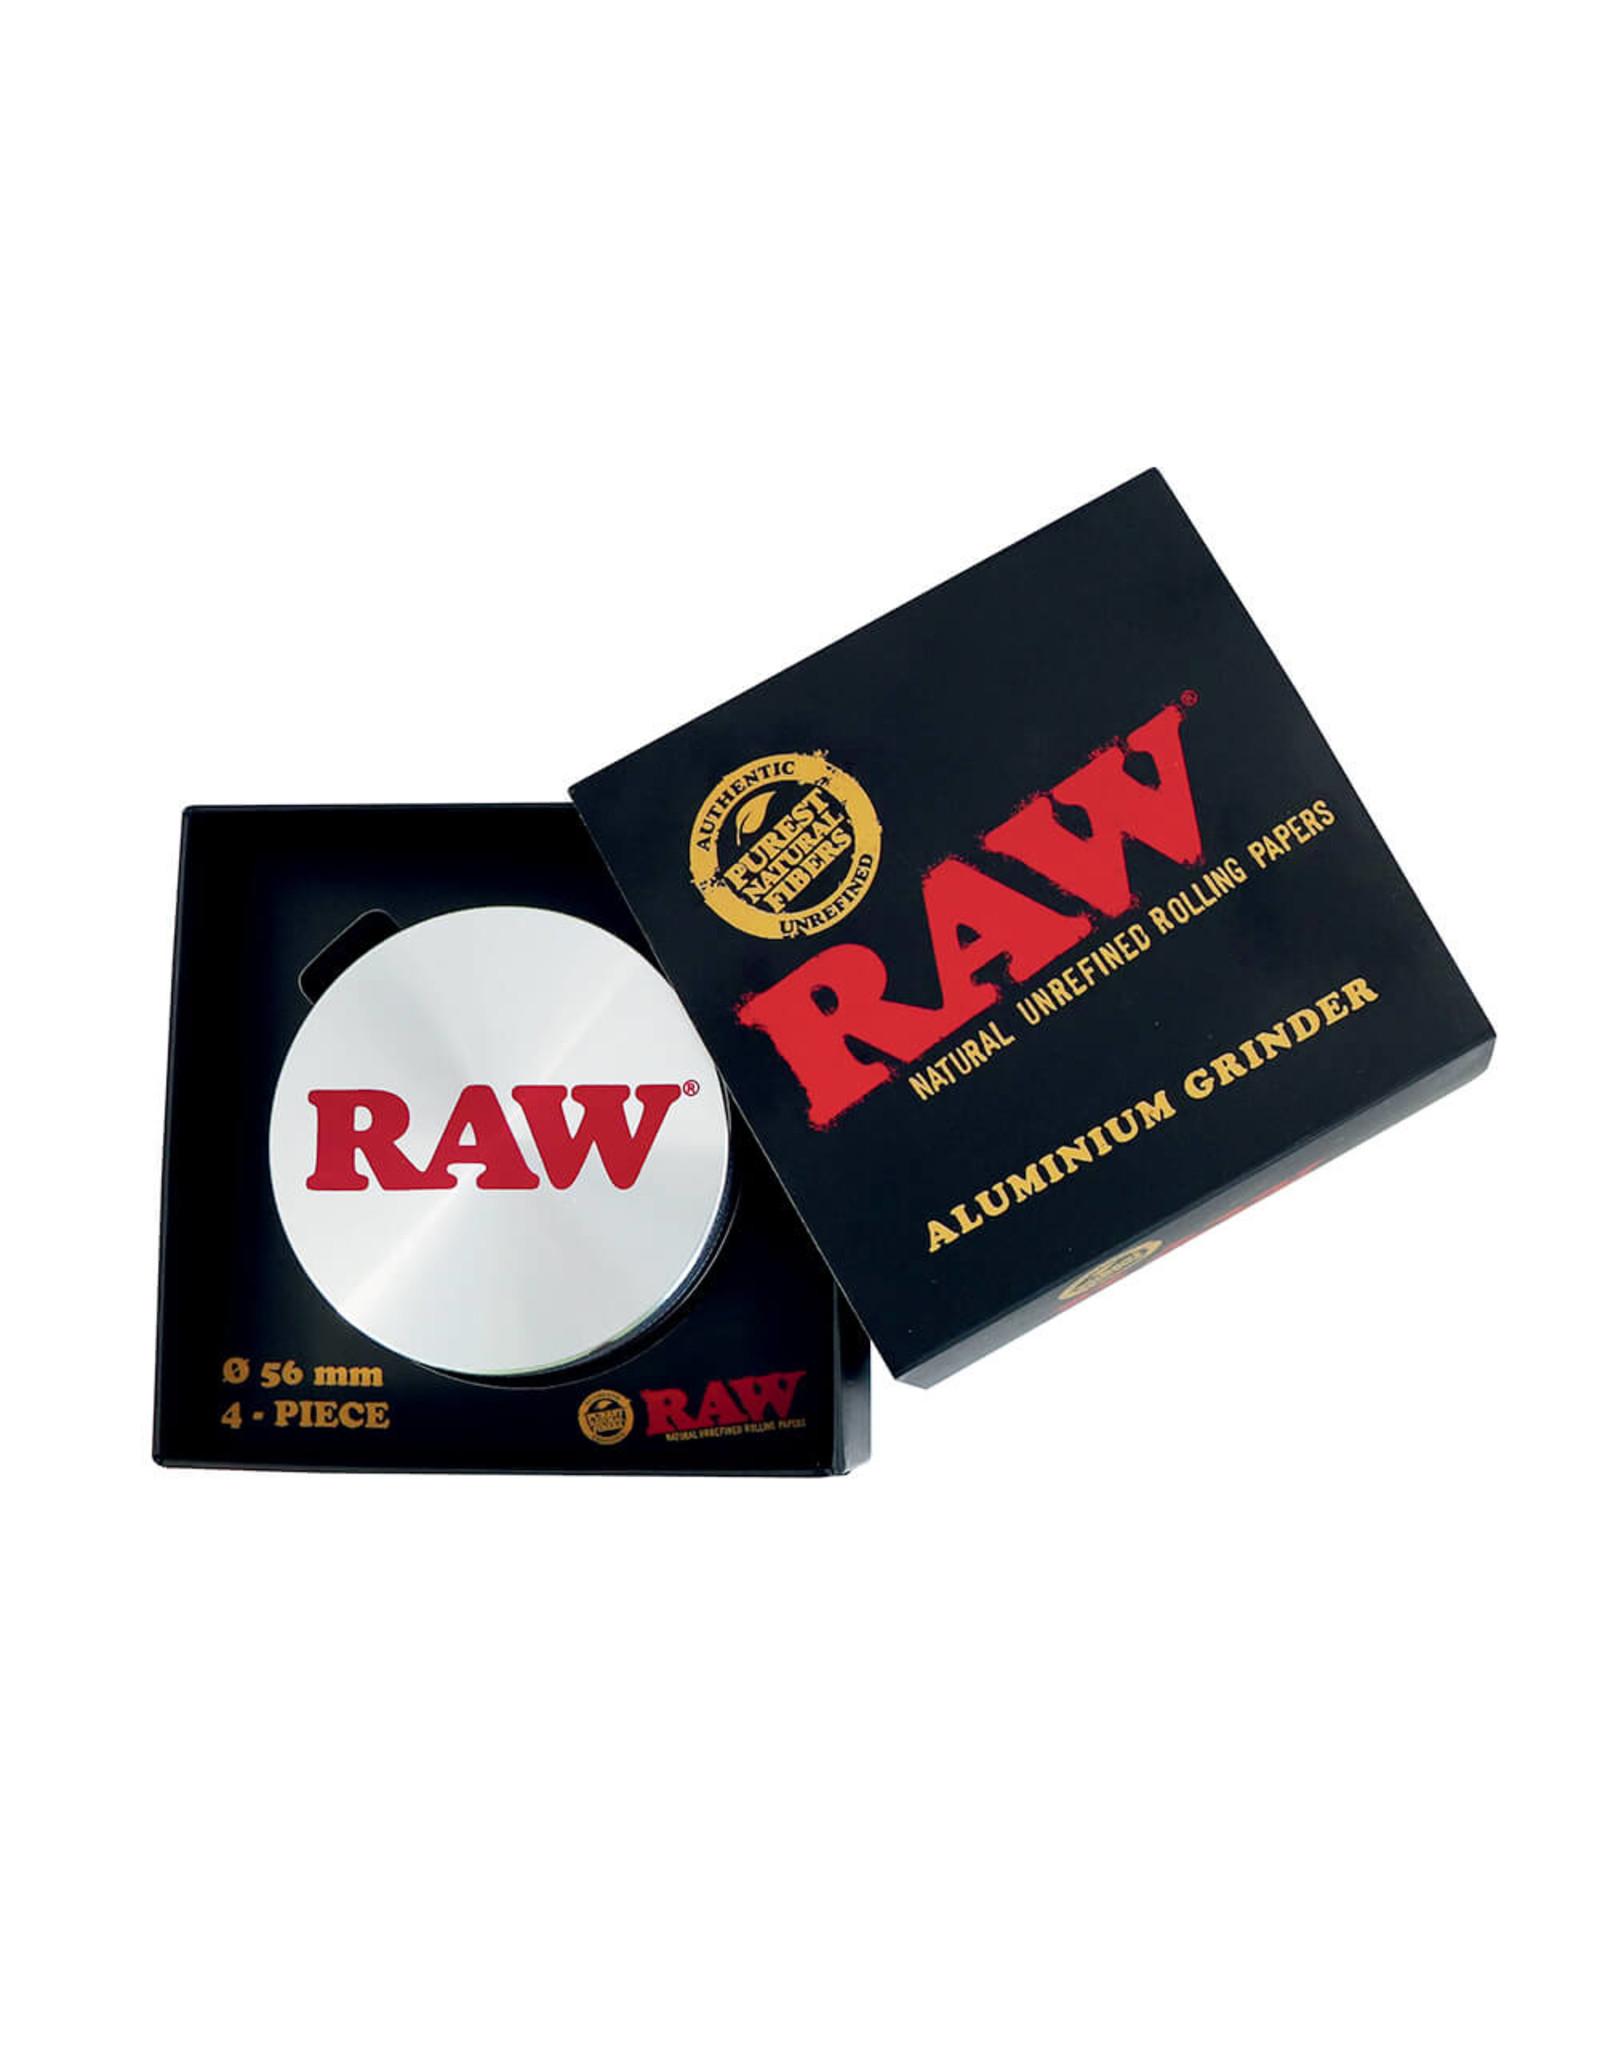 RAW RAW Oringinal Grinder (4 parts)